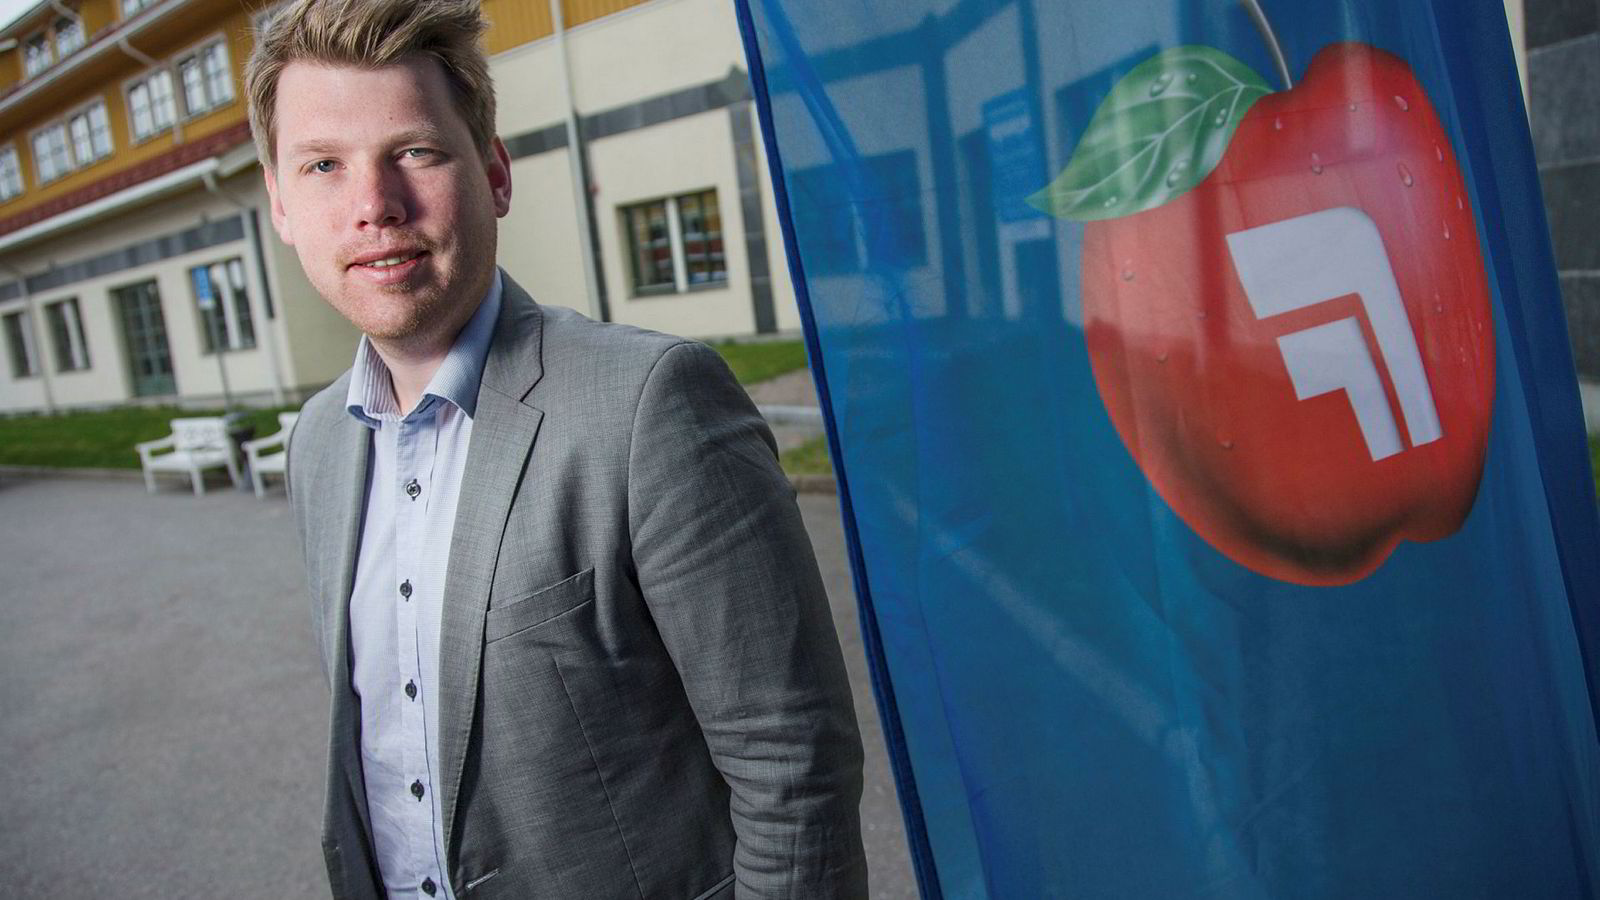 Gardermoen 20140503. Atle Simonsen, formann i Fremskrittspartiets Ungdom (FpU), under Frp sitt landsmøte på Gardermoen lørdag. Foto: Audun Braastad / NTB scanpix ---